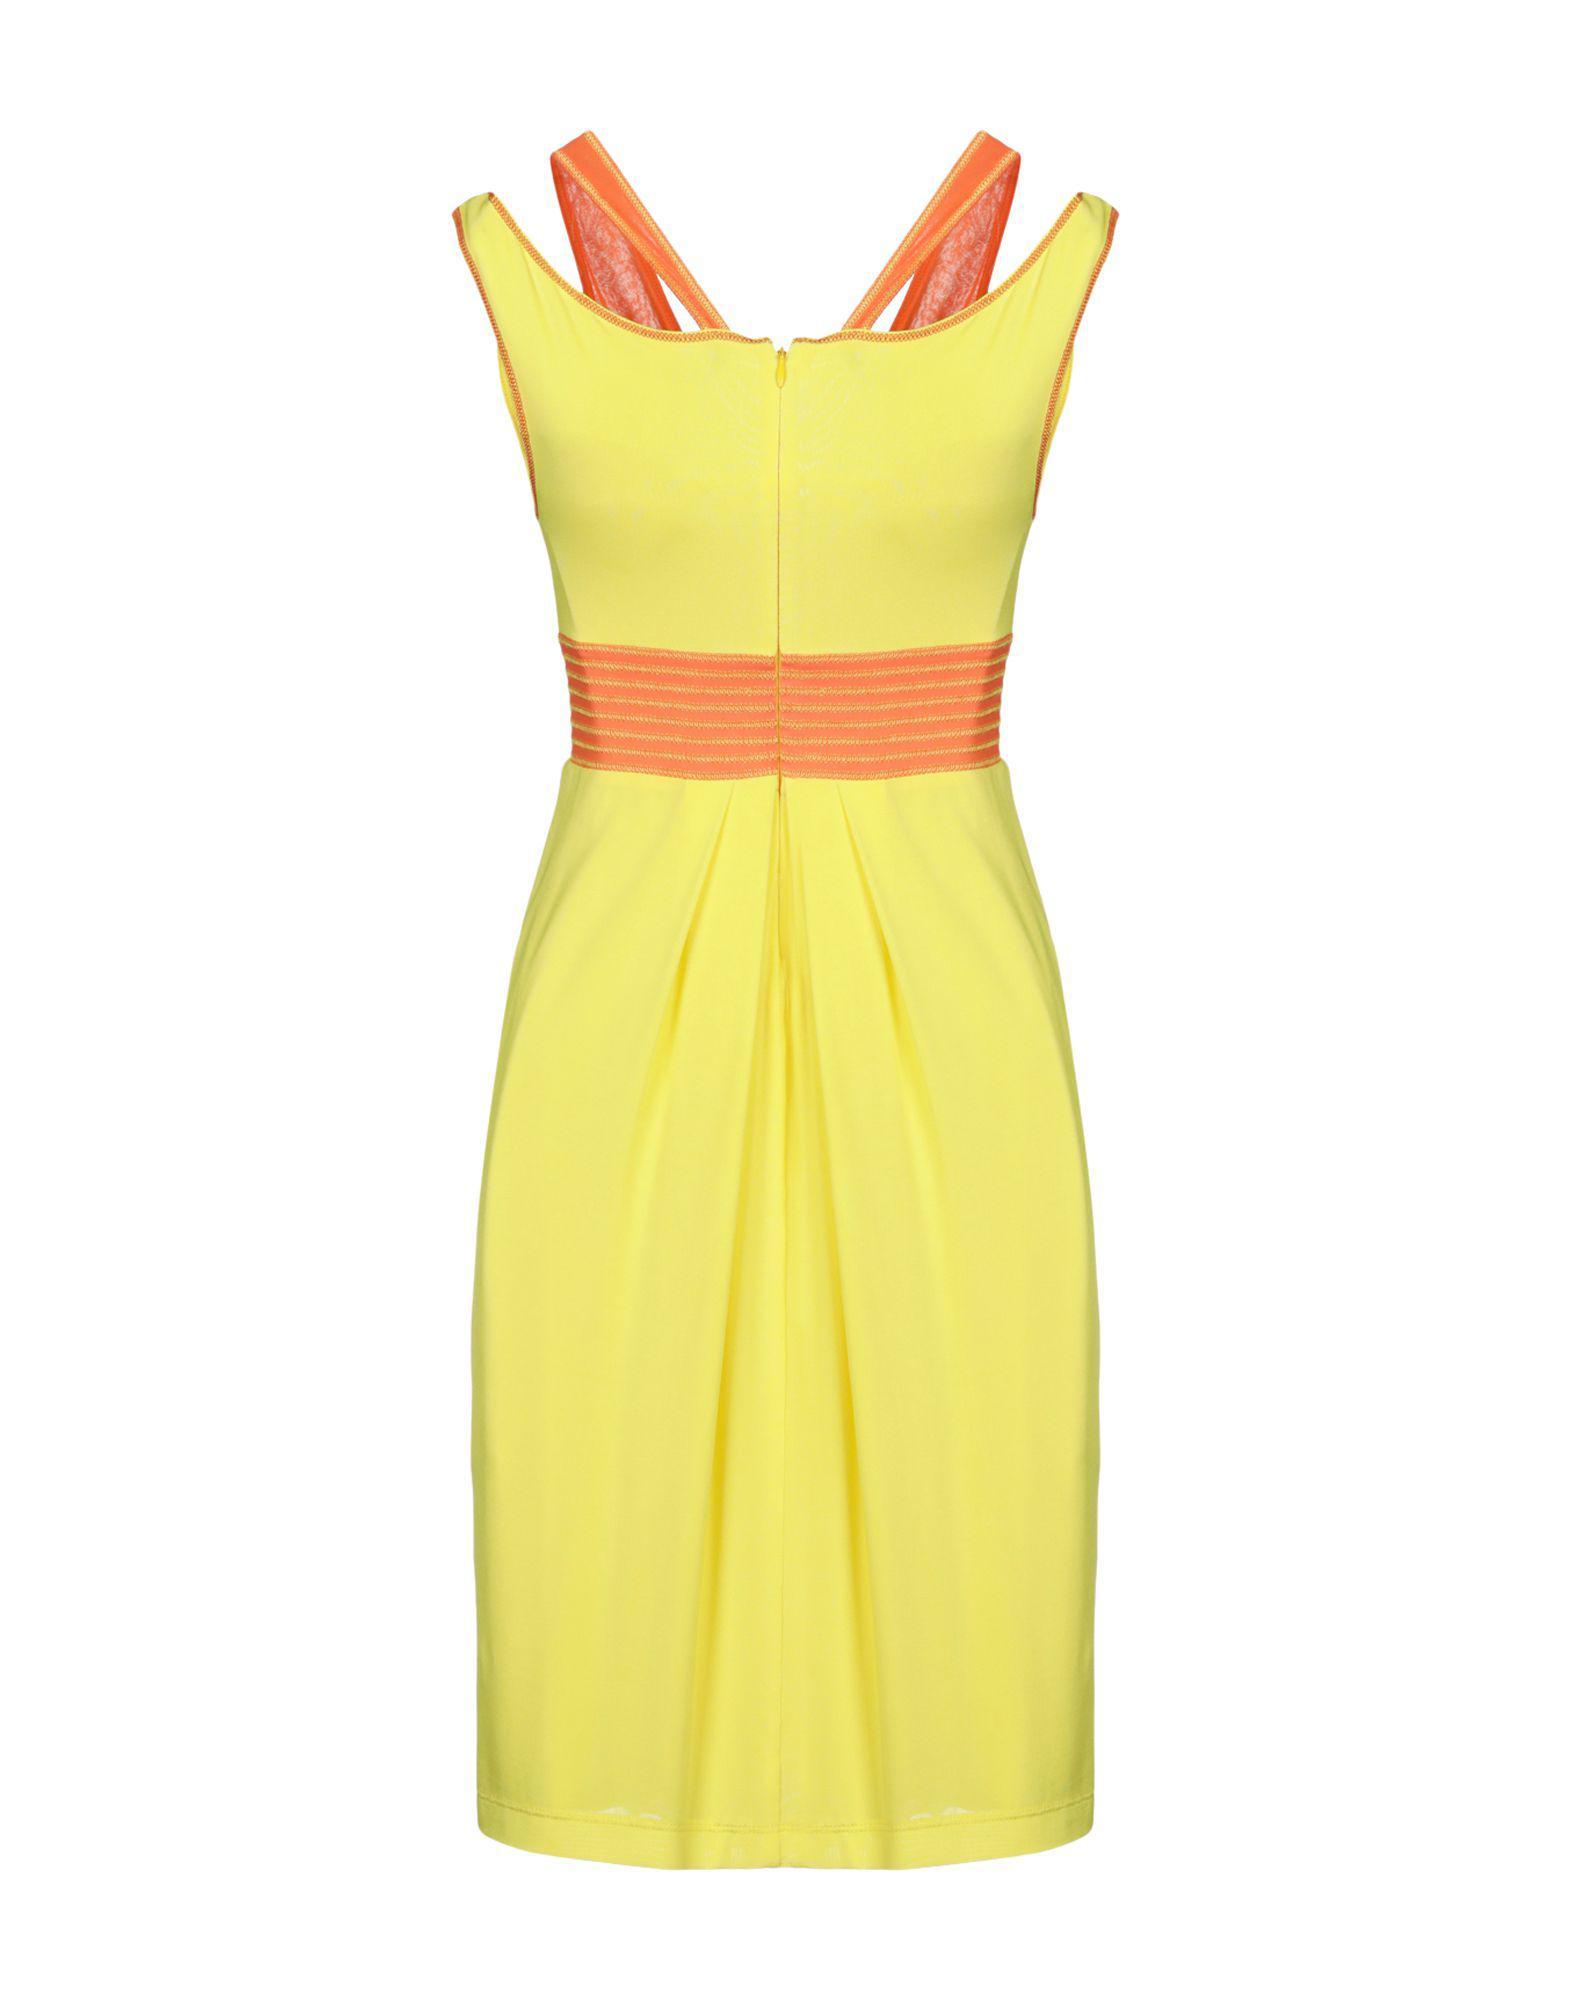 Rocco Barocco Short Dress in Yellow - Lyst 692f5899a57